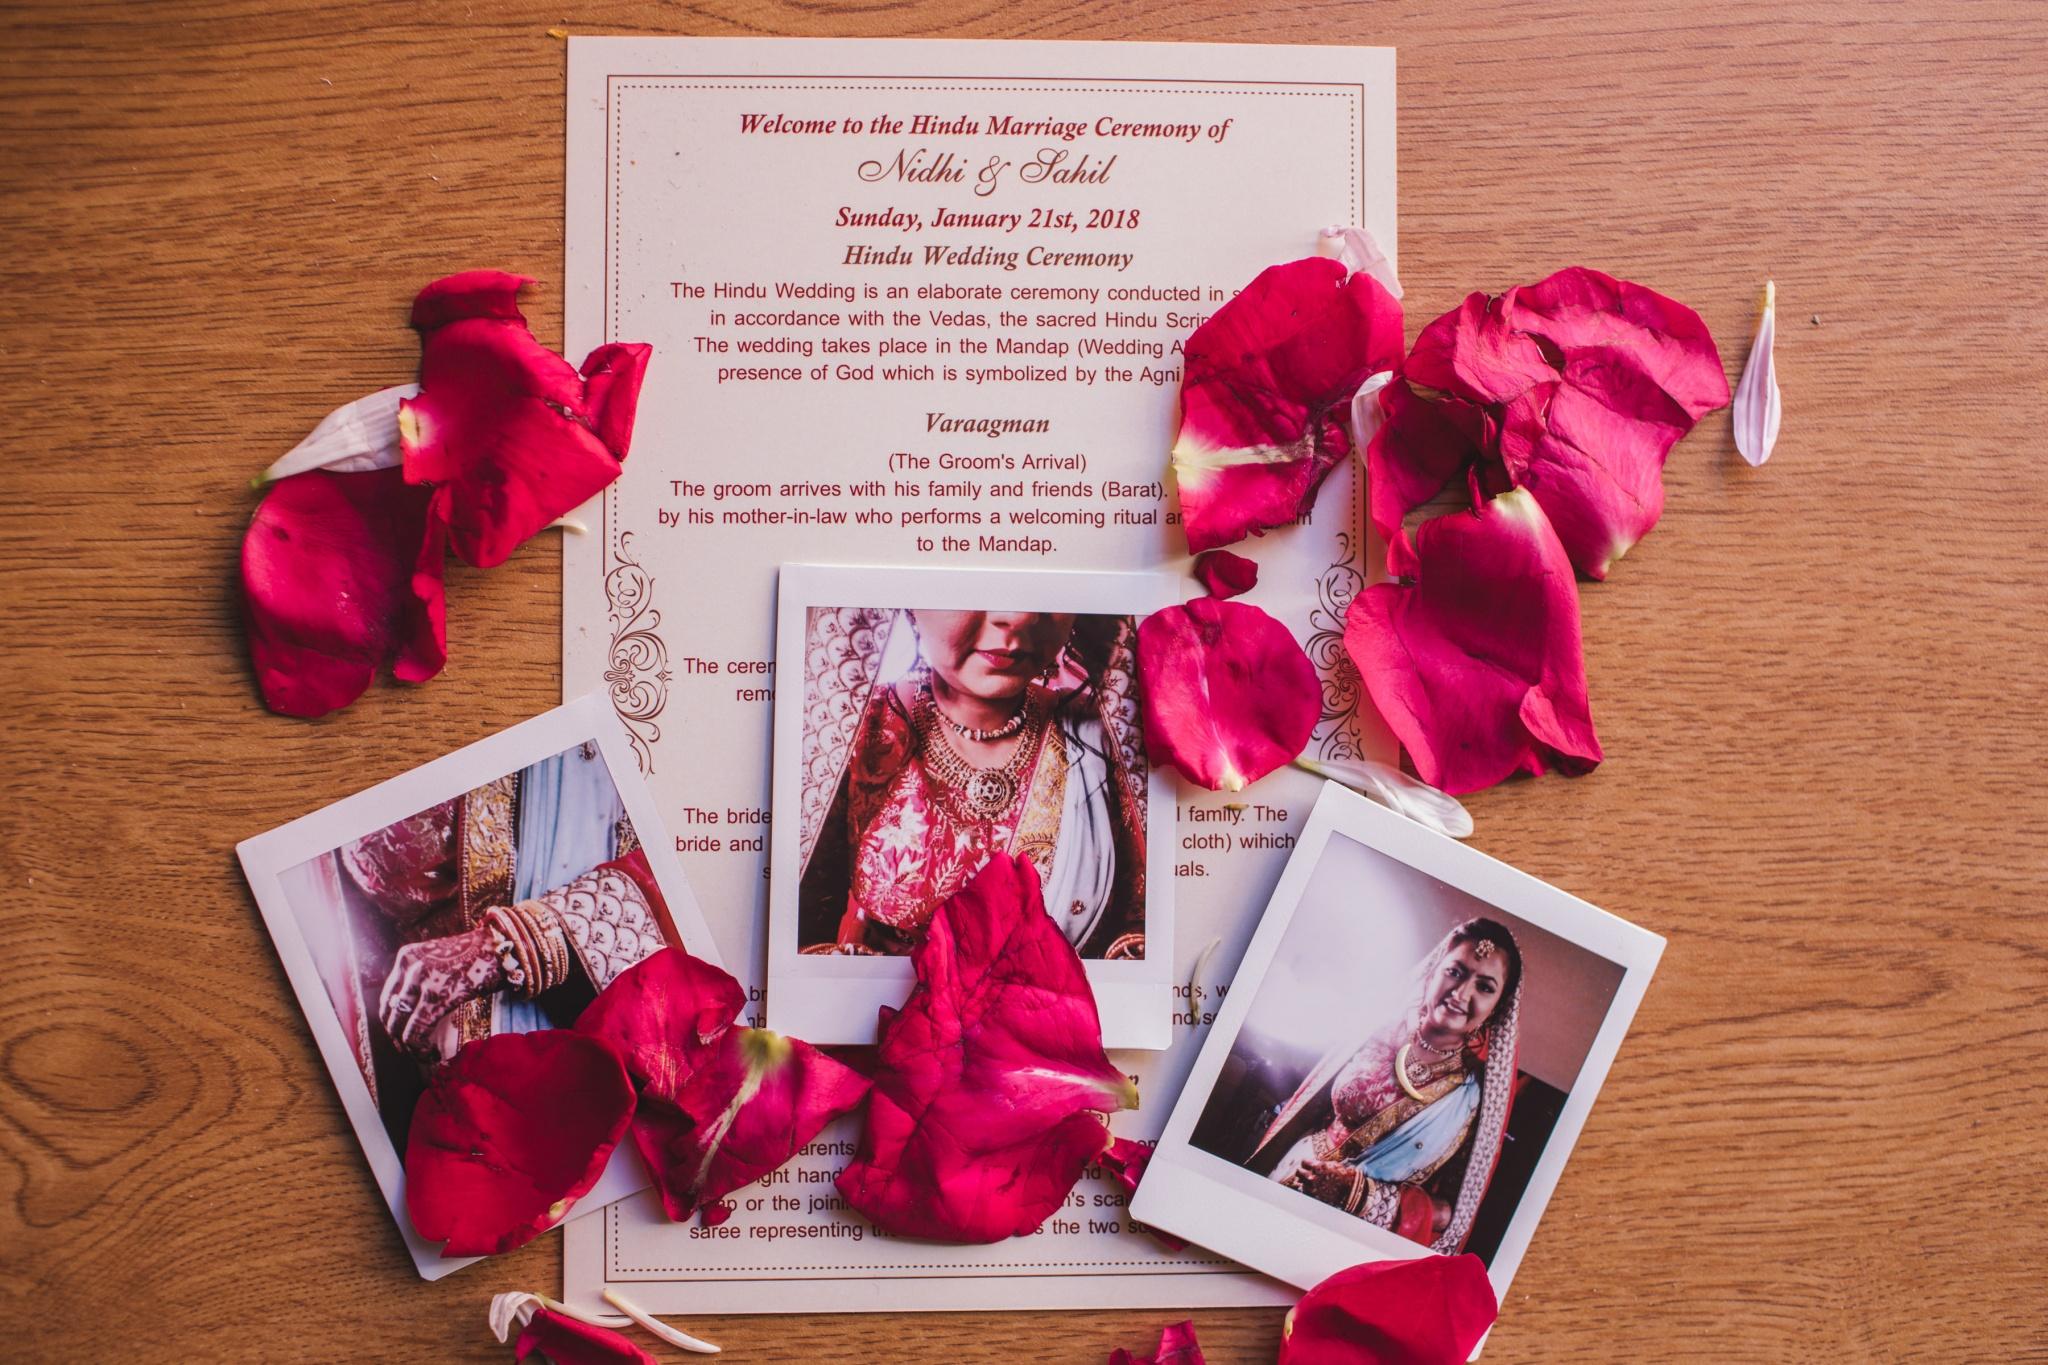 Nidhi + Sahil's Wedding Ceremony